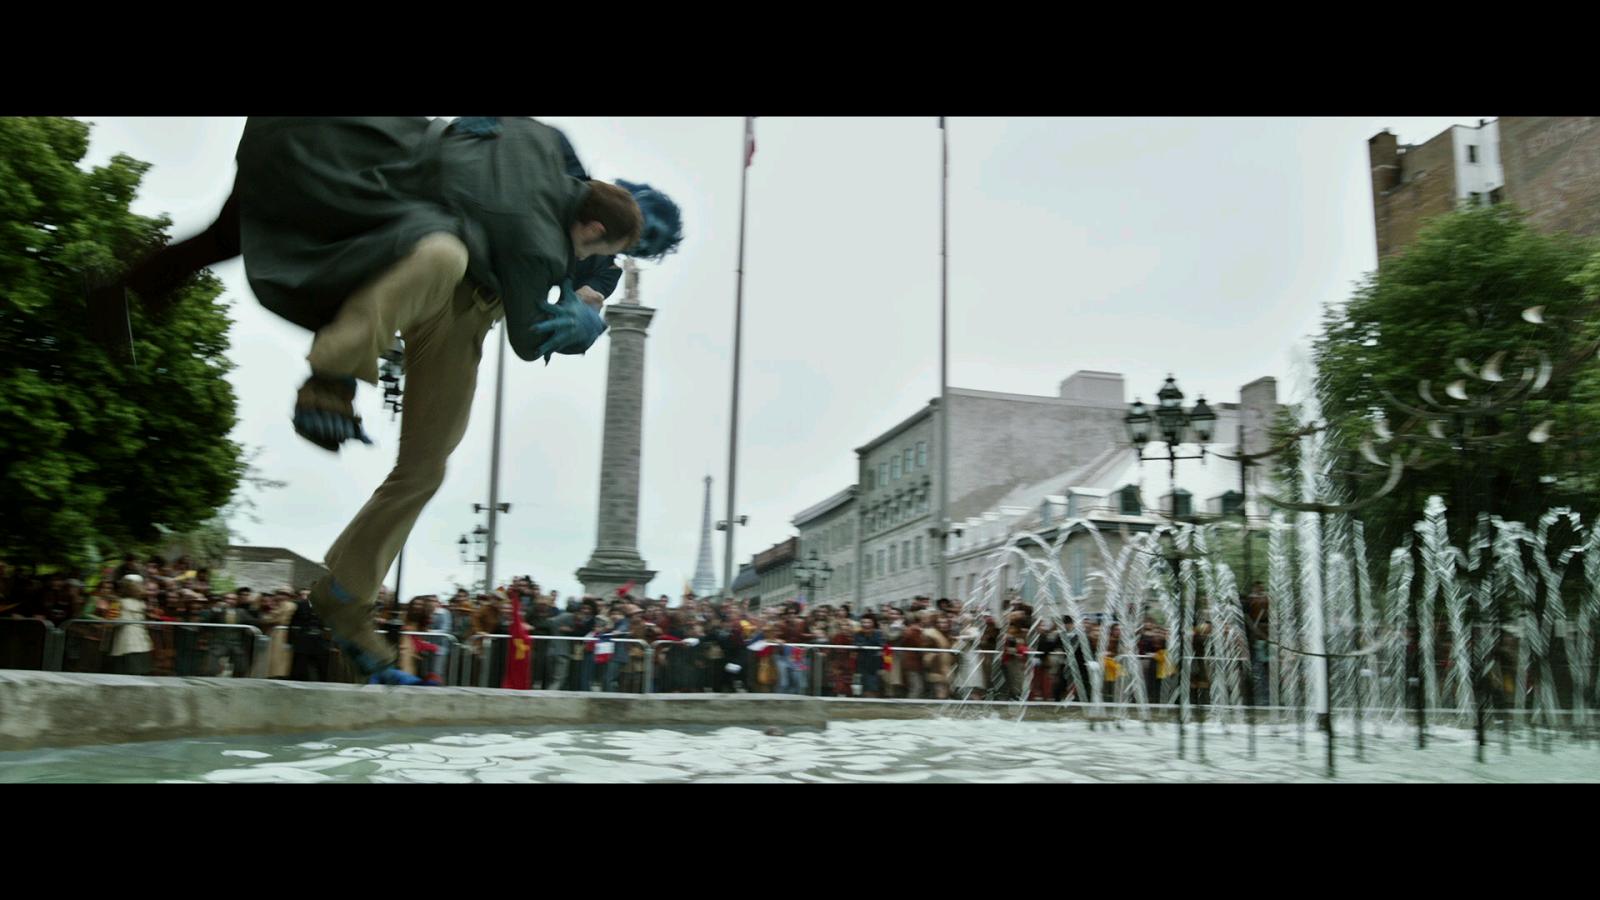 X-Men Días Del Futuro Pasado (2014) 2D + 3D 1080p BD25 1